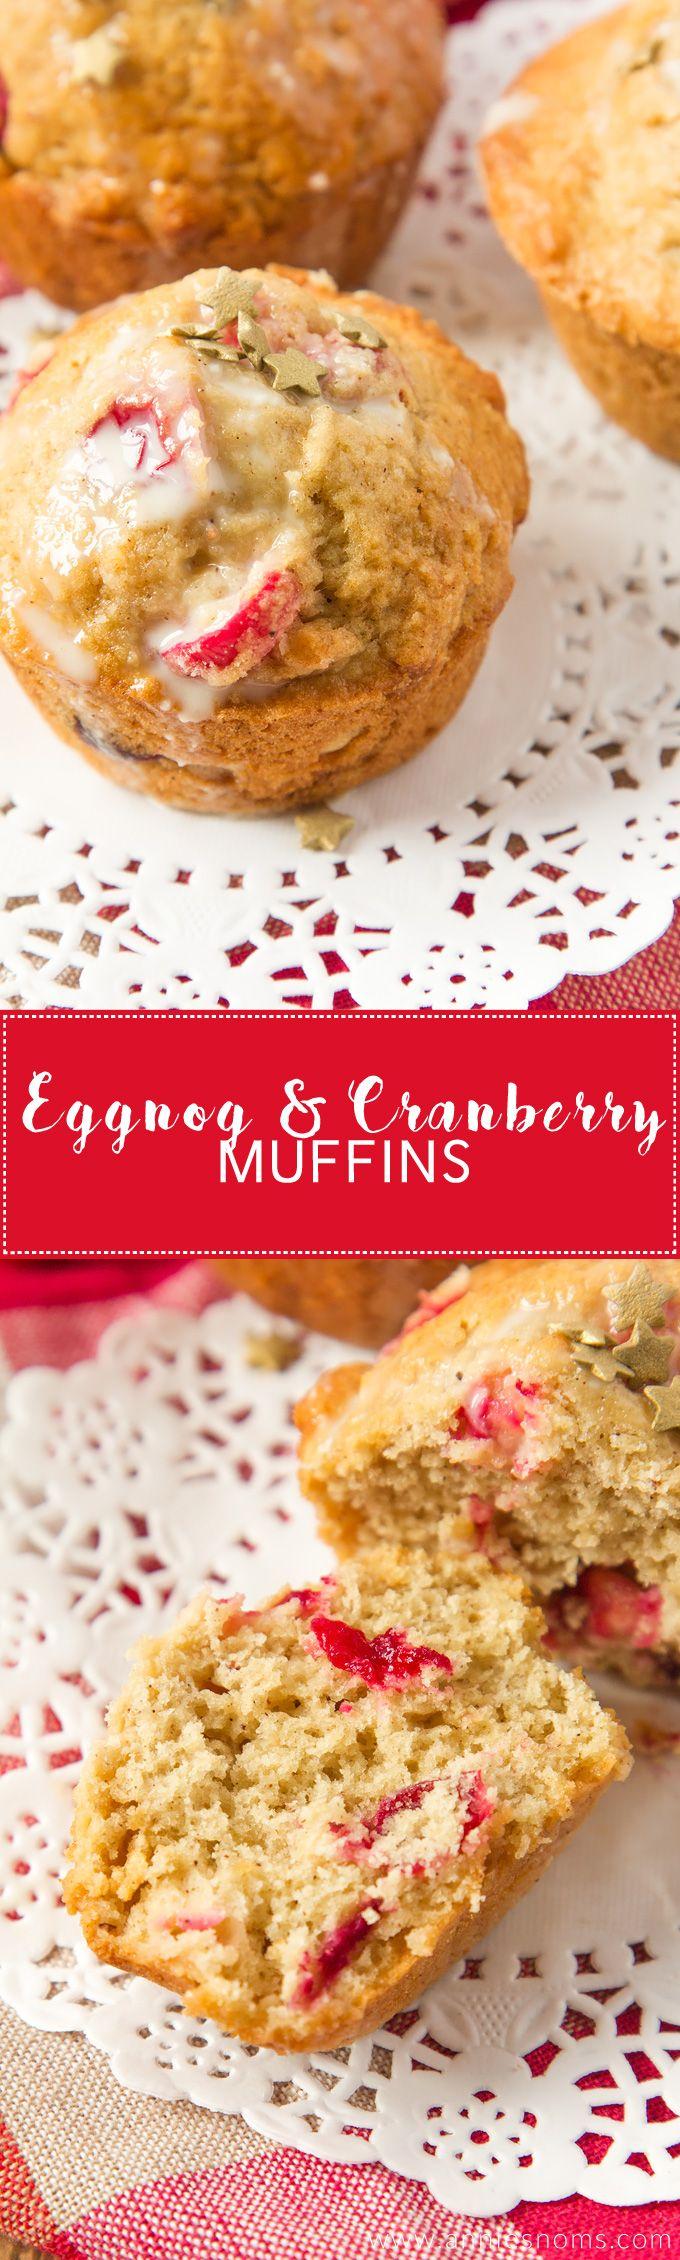 ... Eggnog, fresh cranberries and plenty of nutmeg to create the perfect